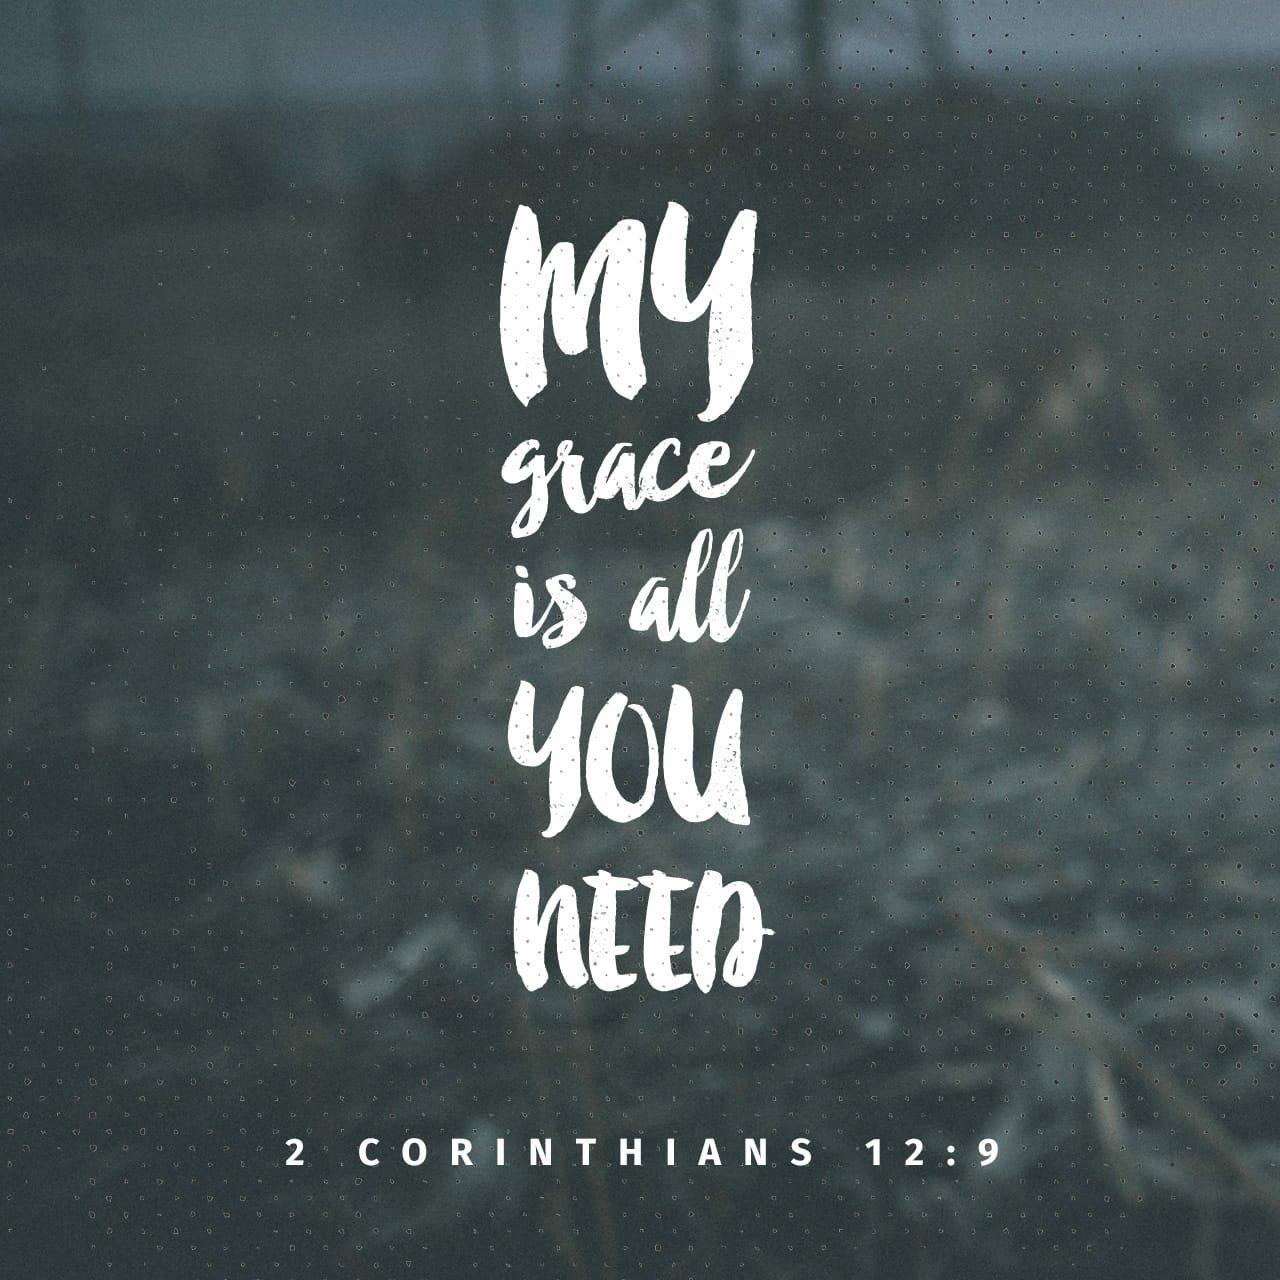 A Prayer for God's Grace